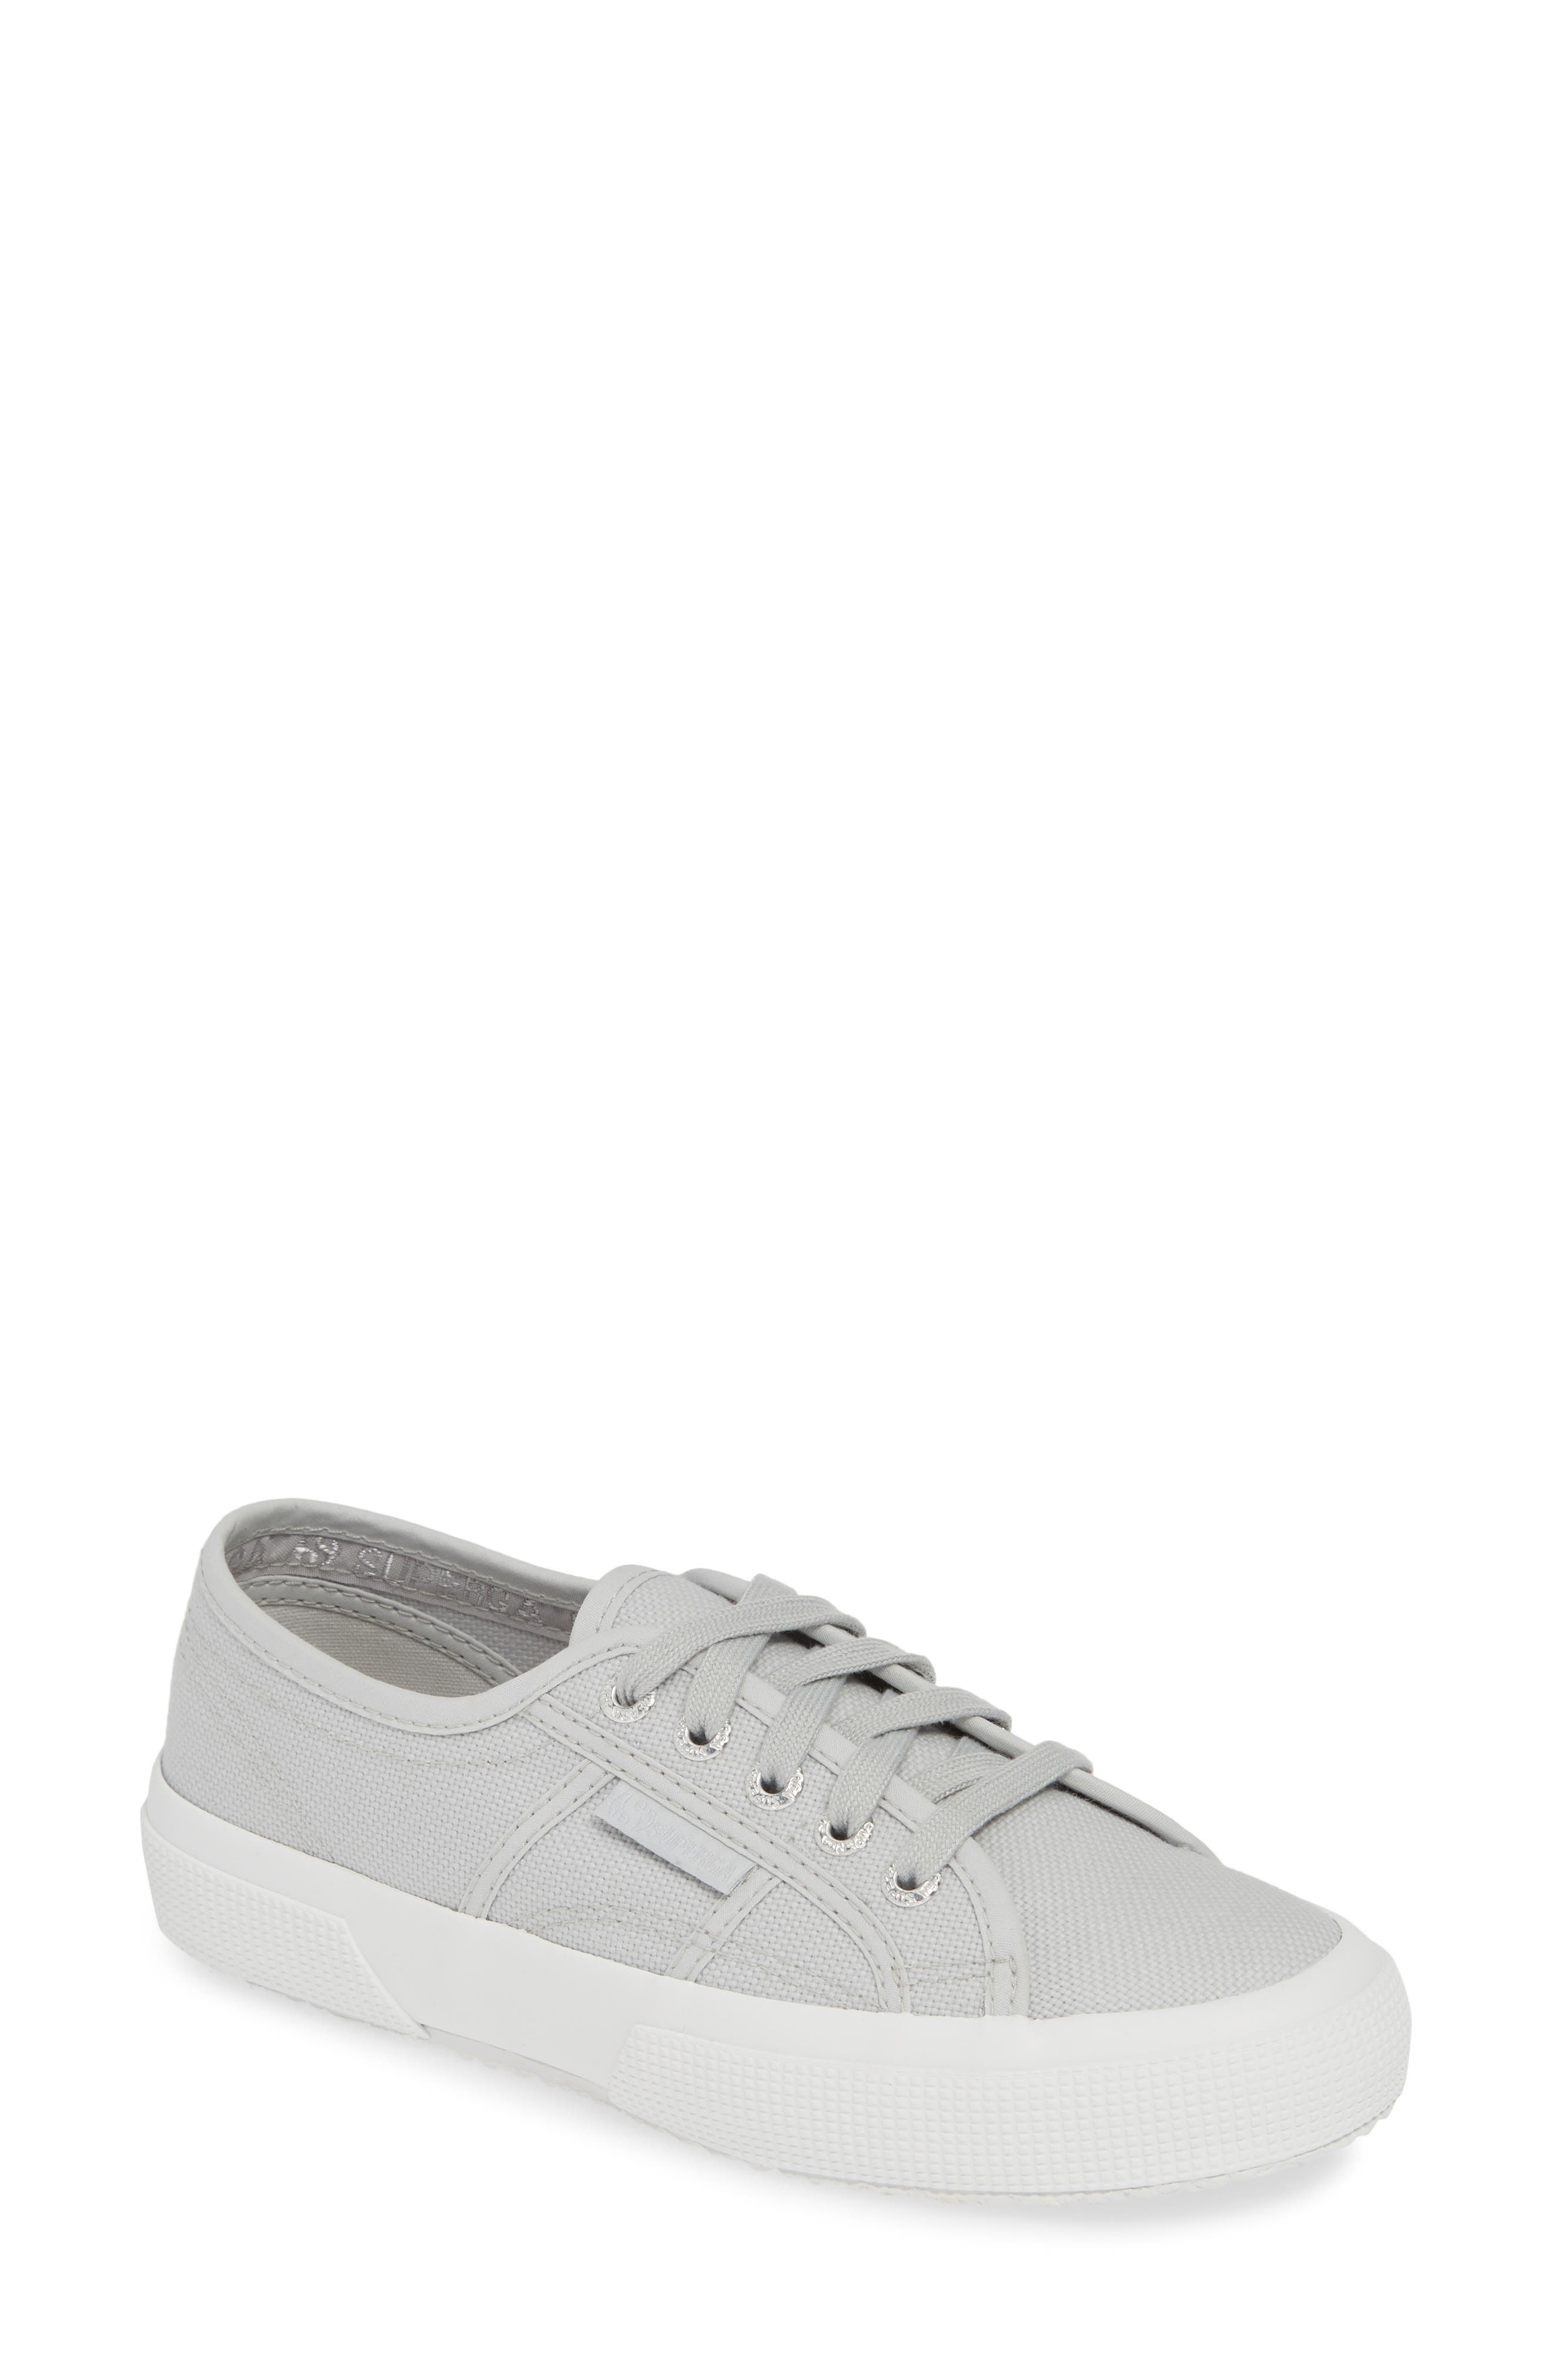 'Cotu' Sneaker, Main, color, BEIGE DOUBLE CREAM